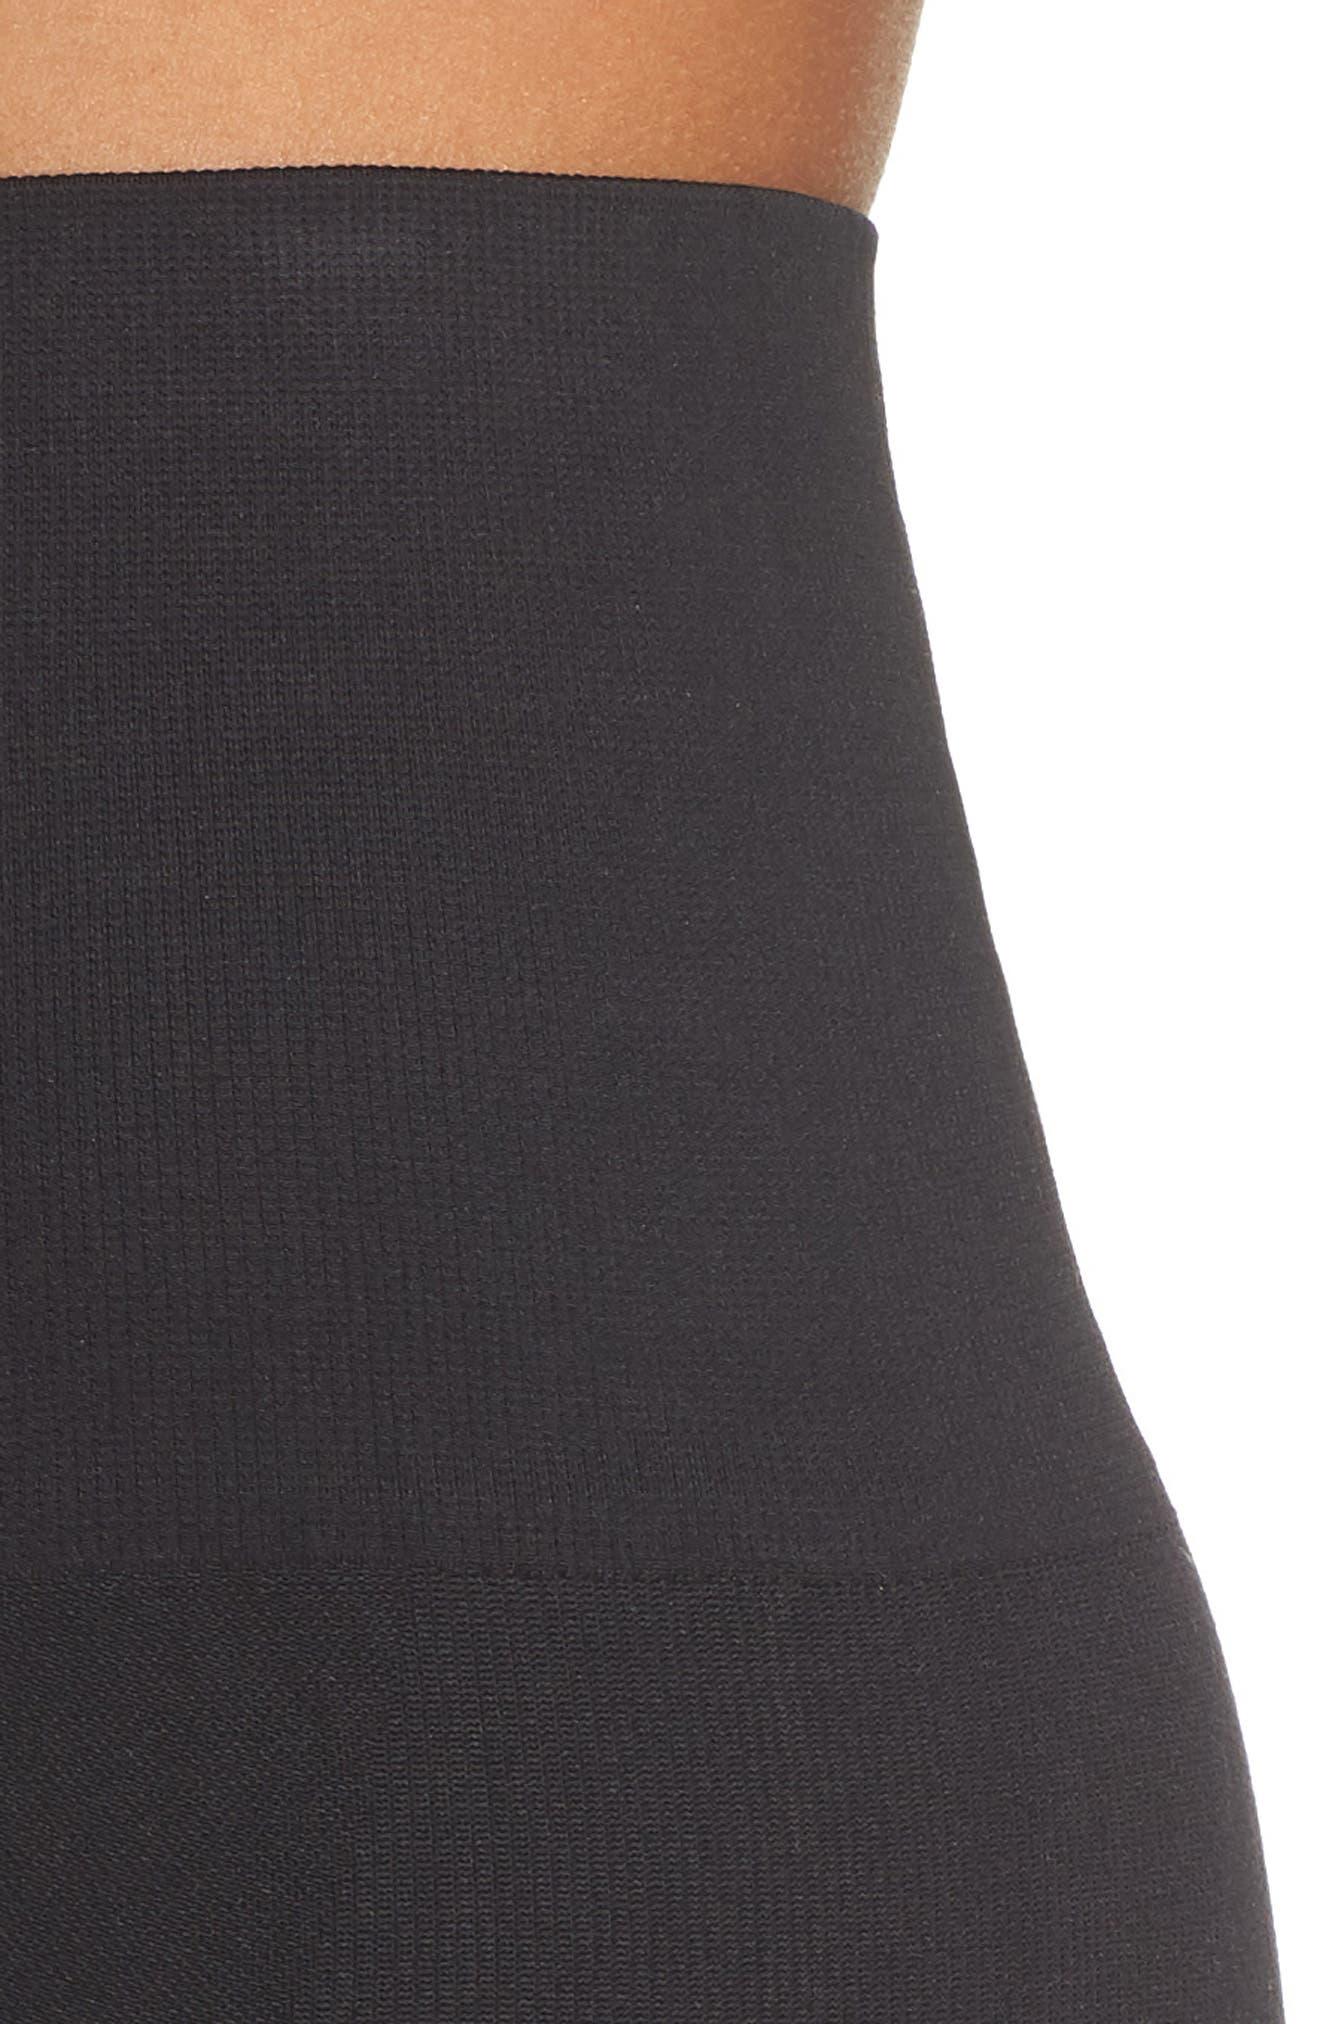 Eight Eight High Waist Leggings,                             Alternate thumbnail 4, color,                             EIGHT EIGHT LEGGNG BLACK